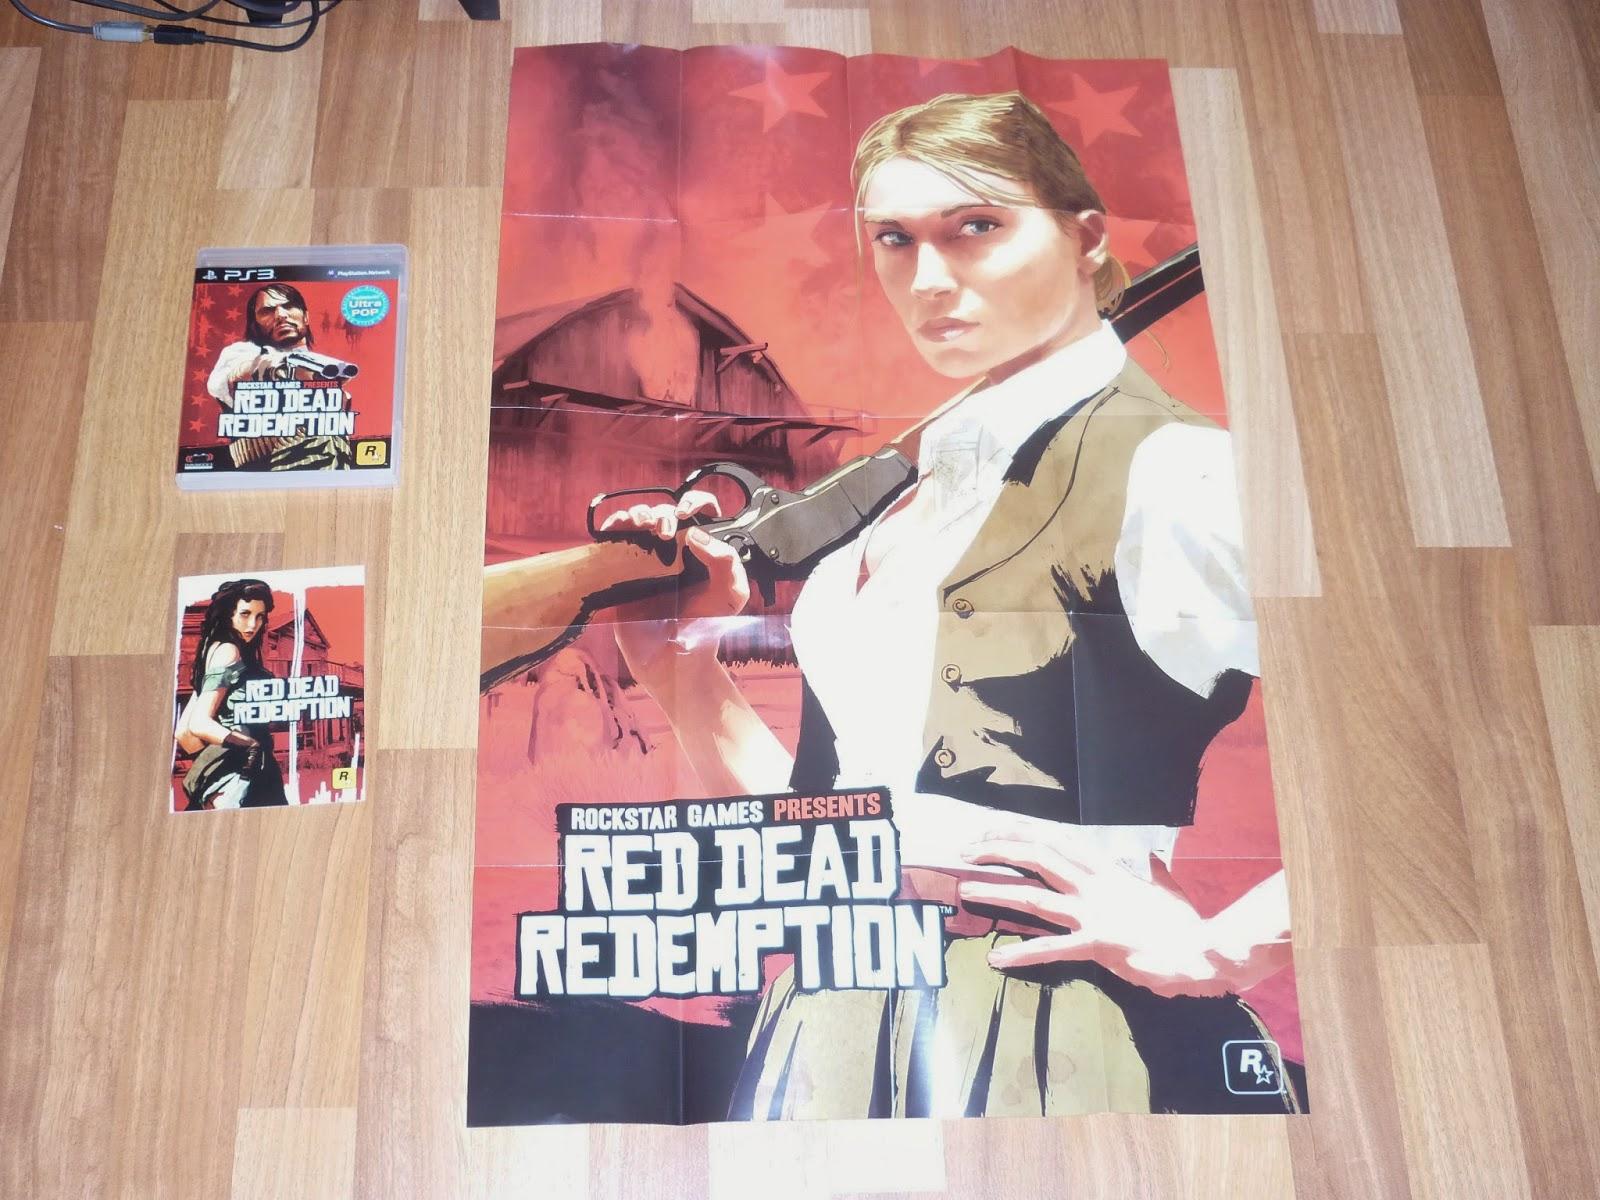 Red Dead Redemption Ost 94 The Assault On Fort Mercer Gattling Gun